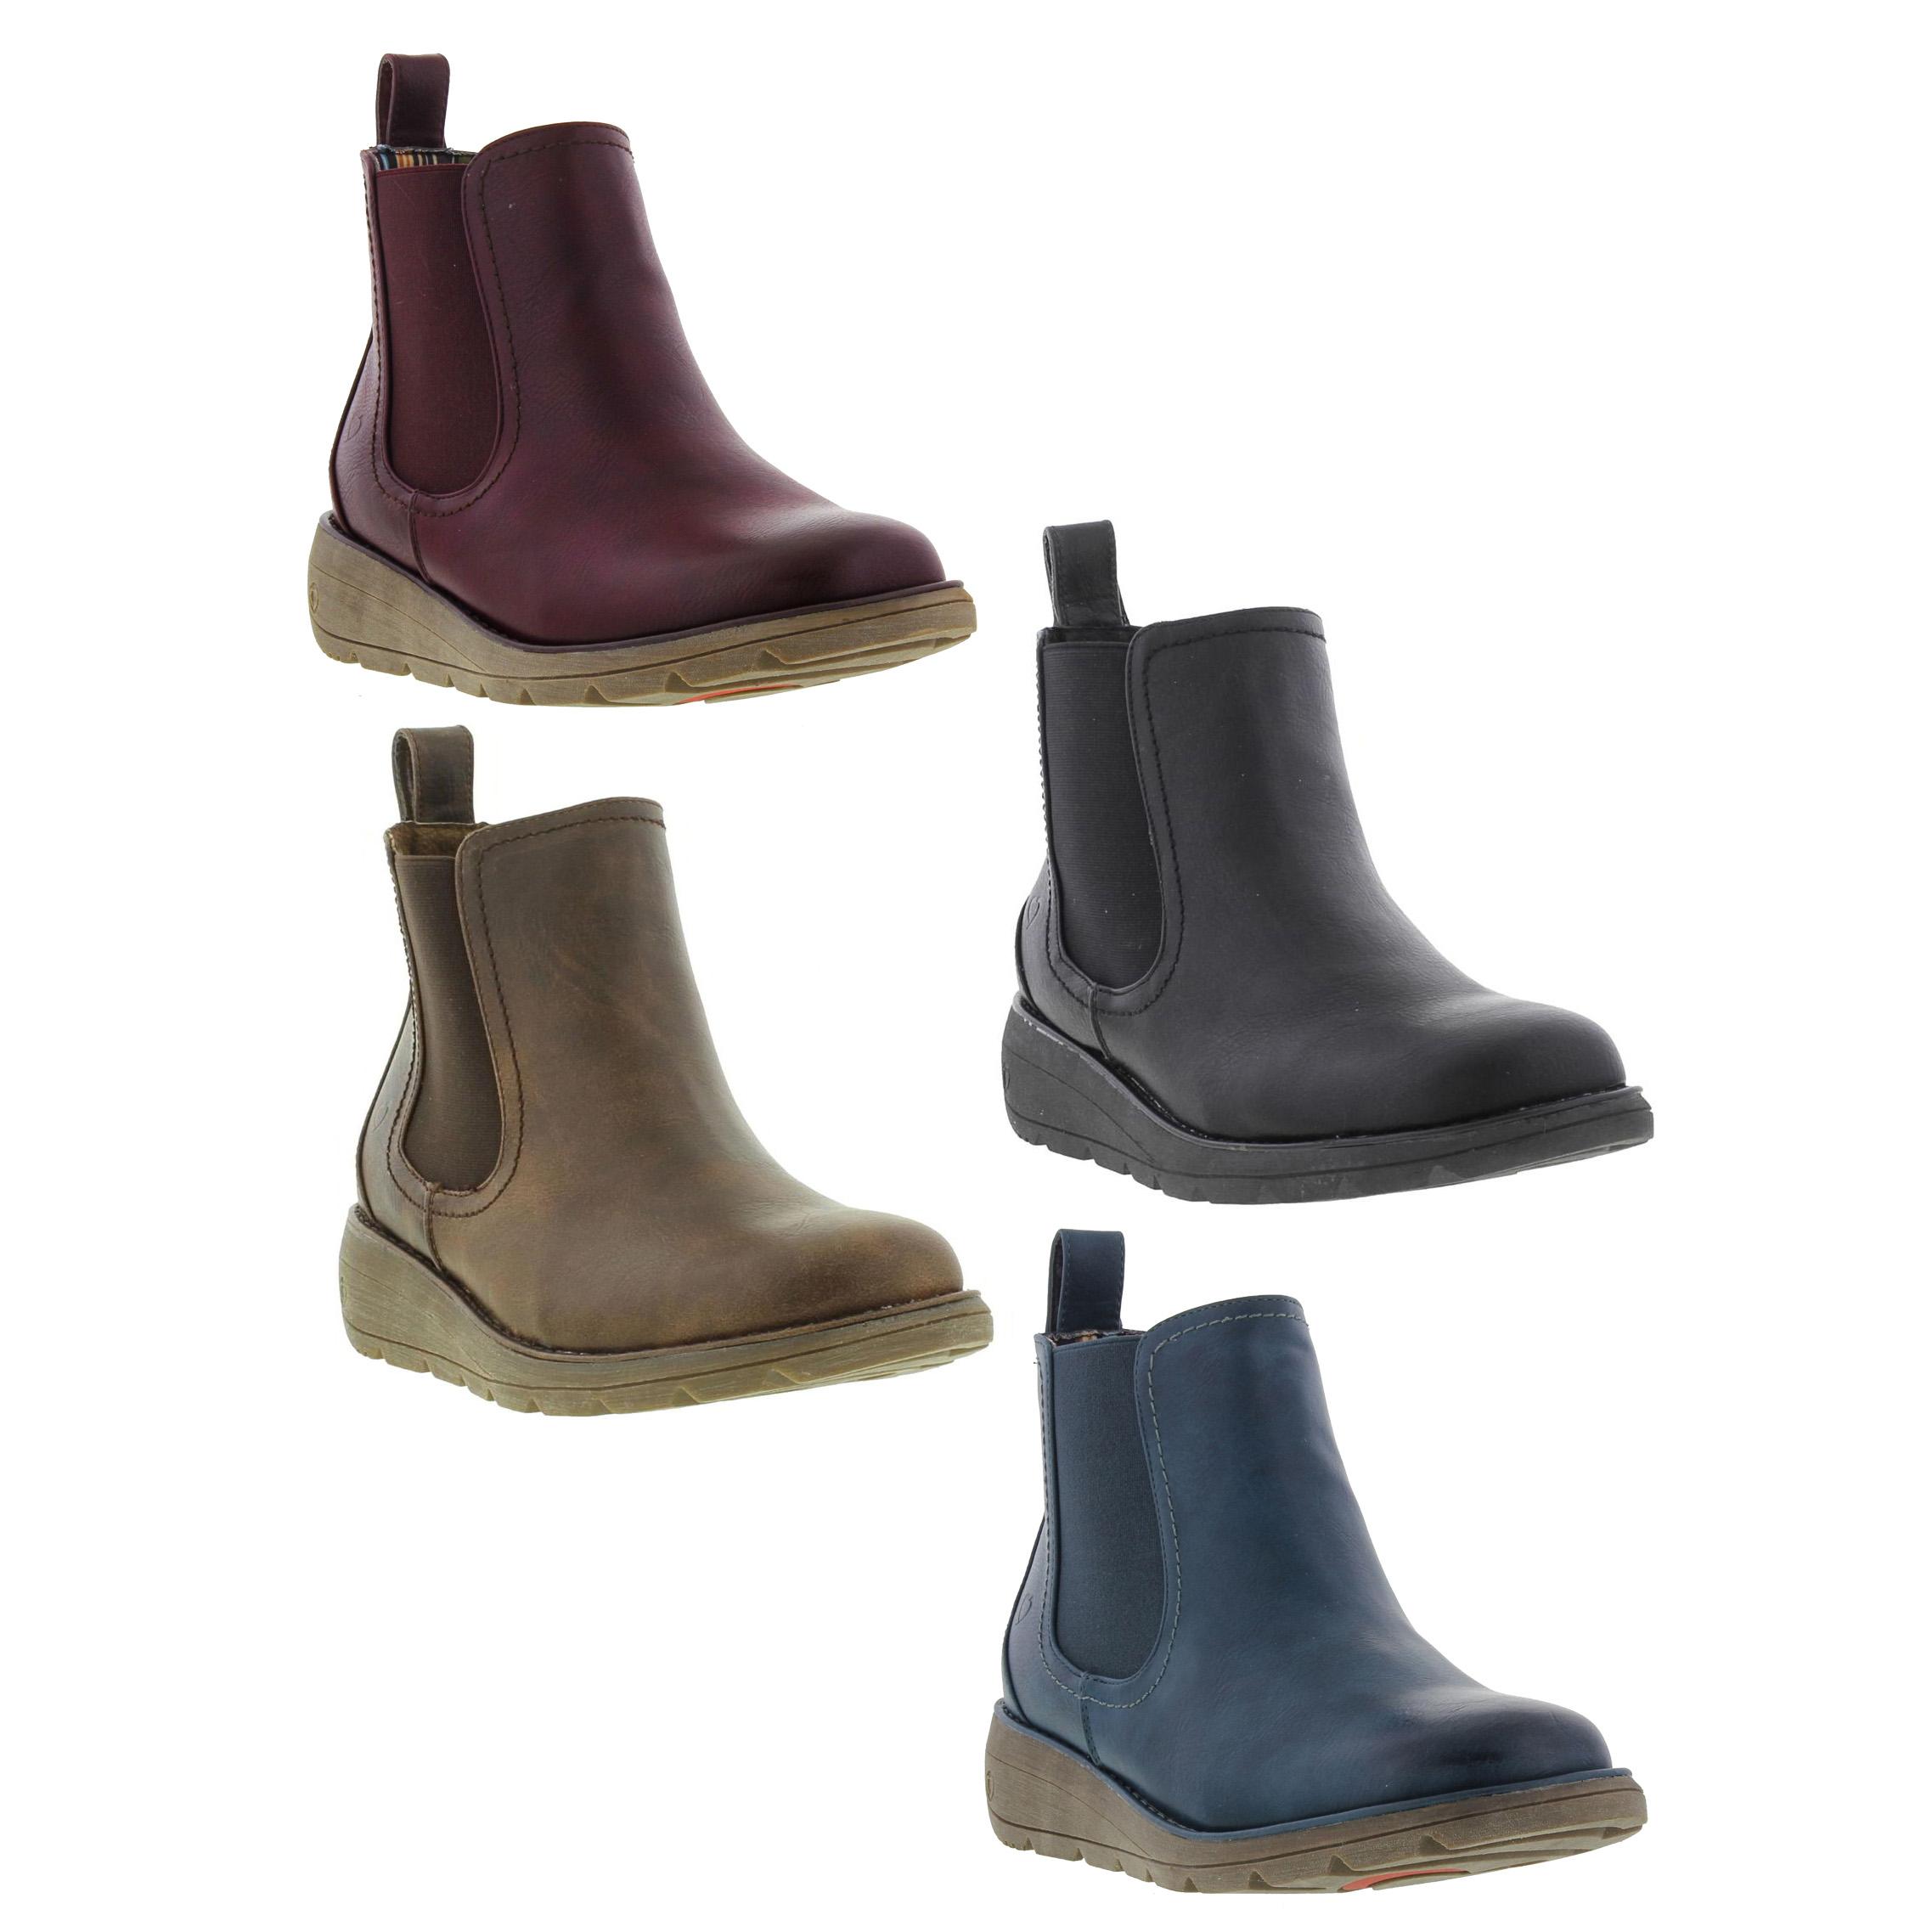 heavenly boots ebay